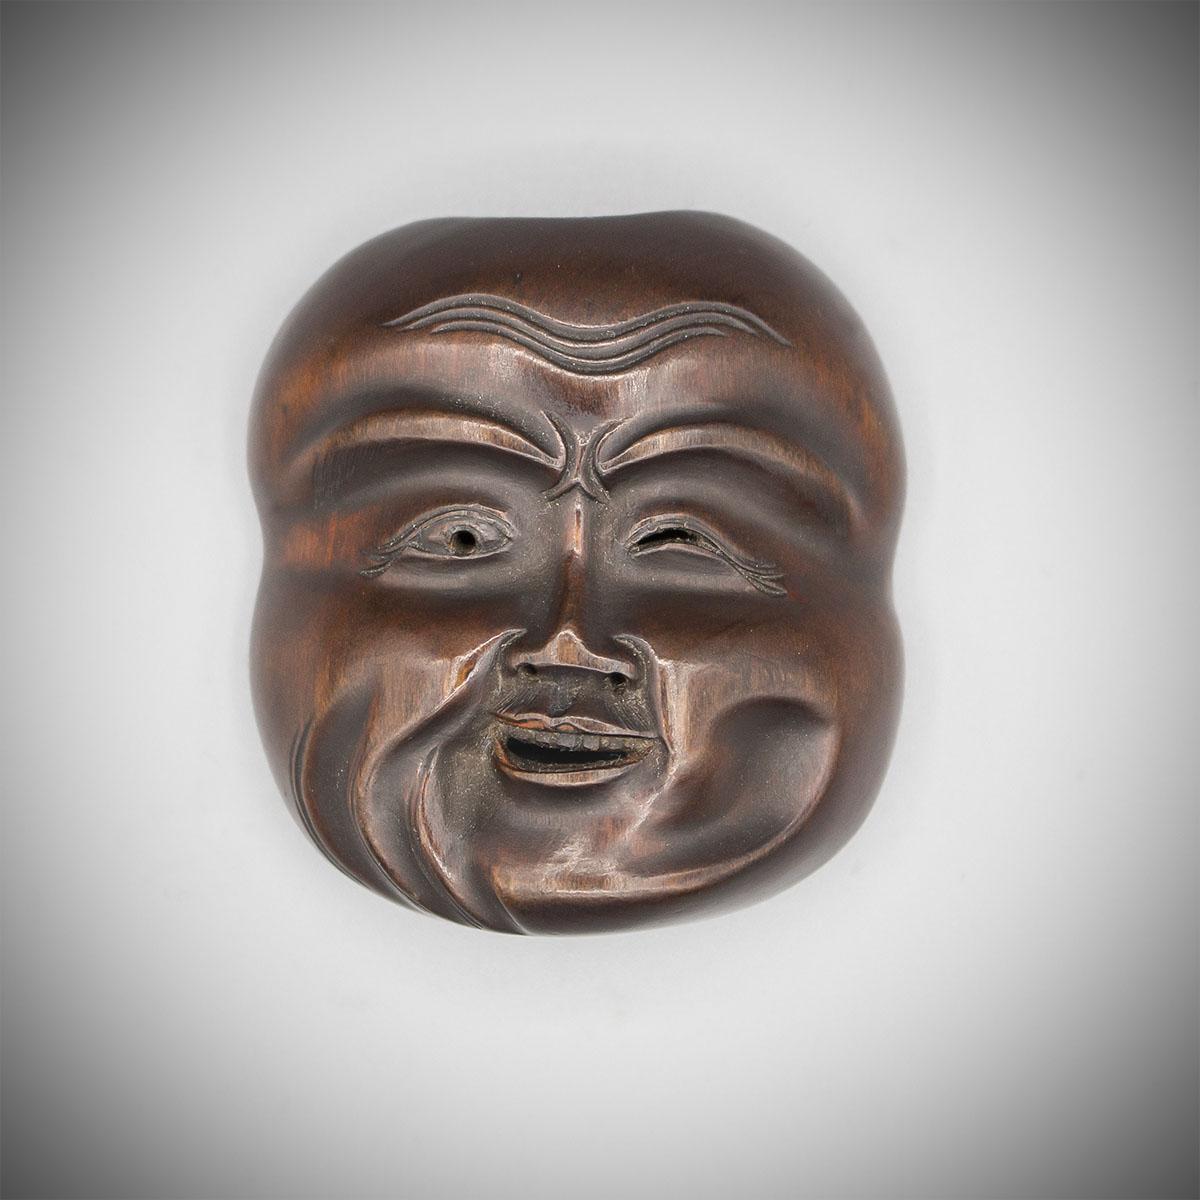 Boxwood mask netsuke by Ghokuzan, MR2722_v.1